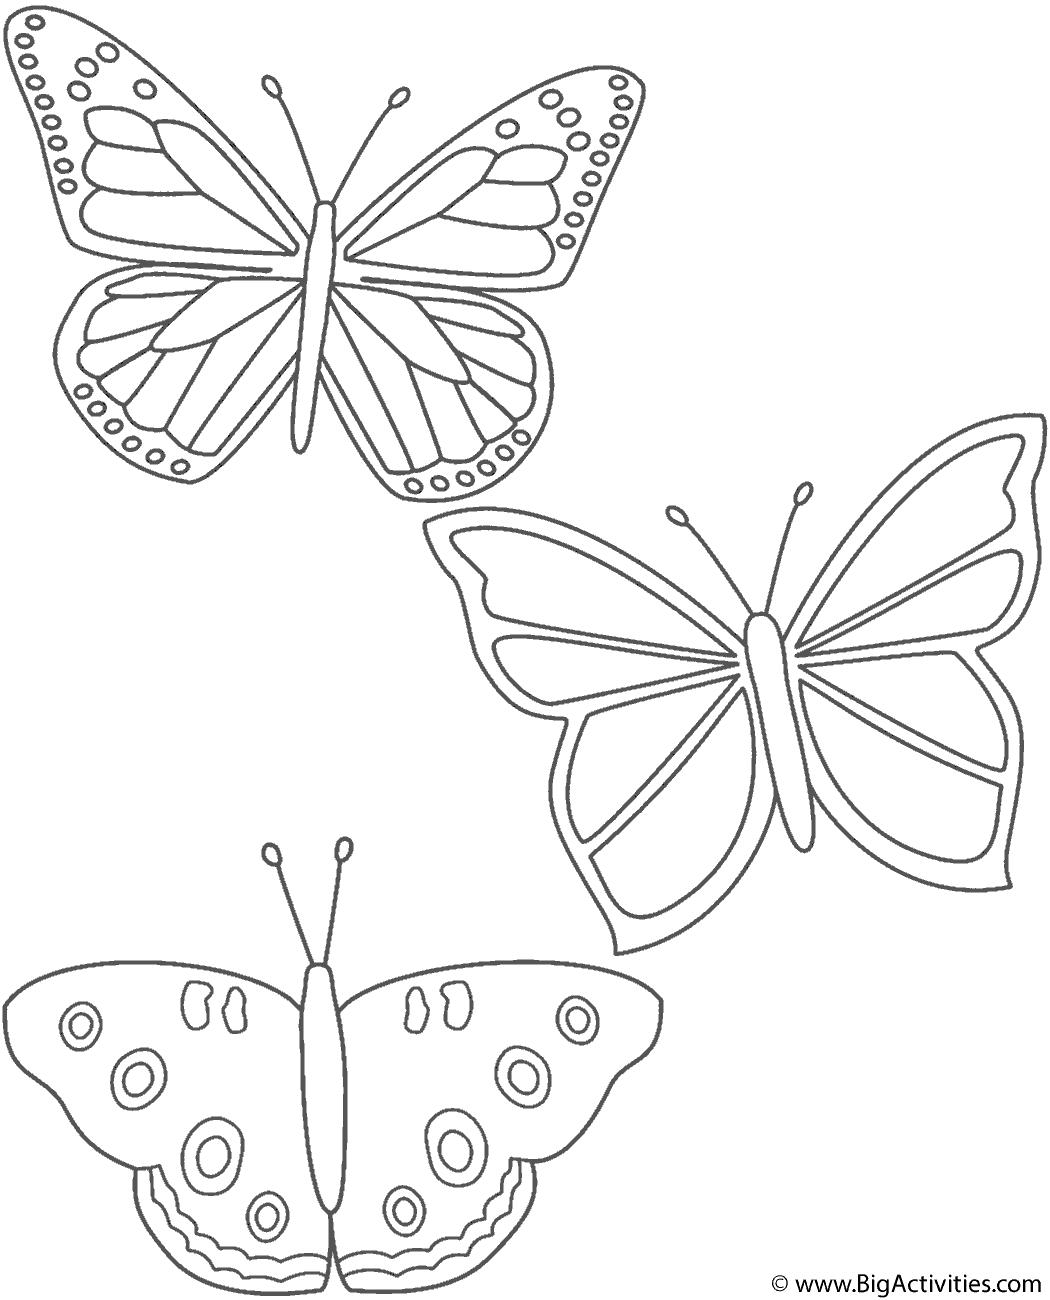 Coloring Page Butterfly Coloring Page Butterfly Illustration Colorful Butterflies [ 1300 x 1050 Pixel ]